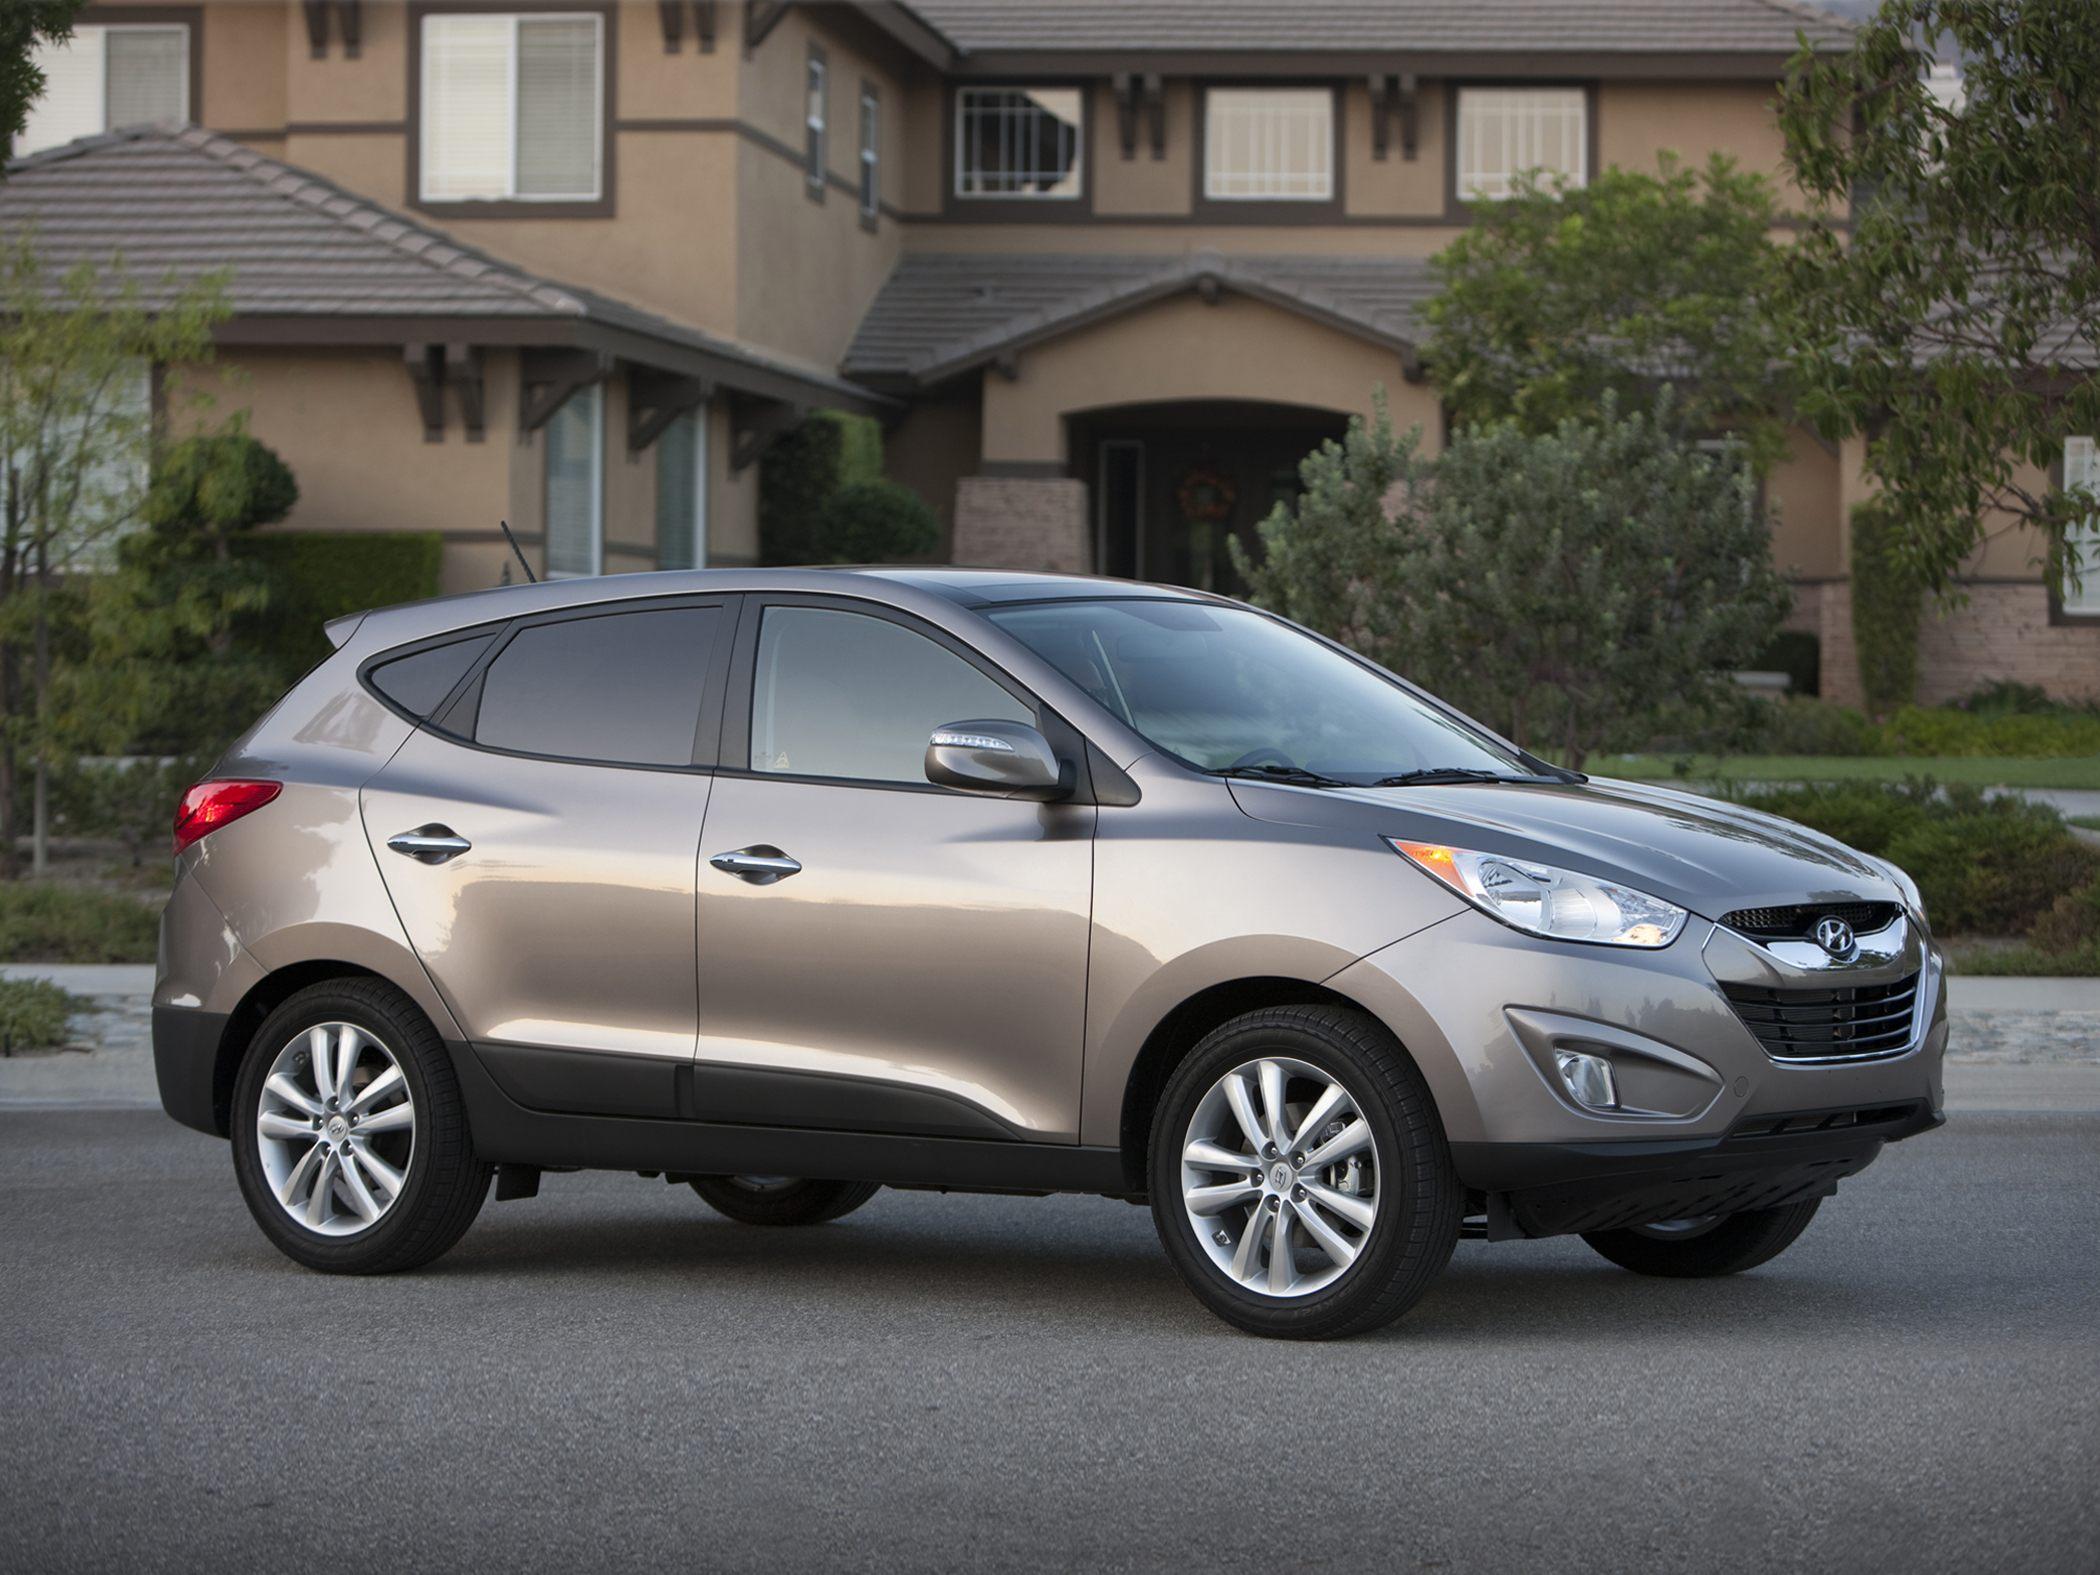 tucson limited autoguide awd news com hyundai review manufacturer side